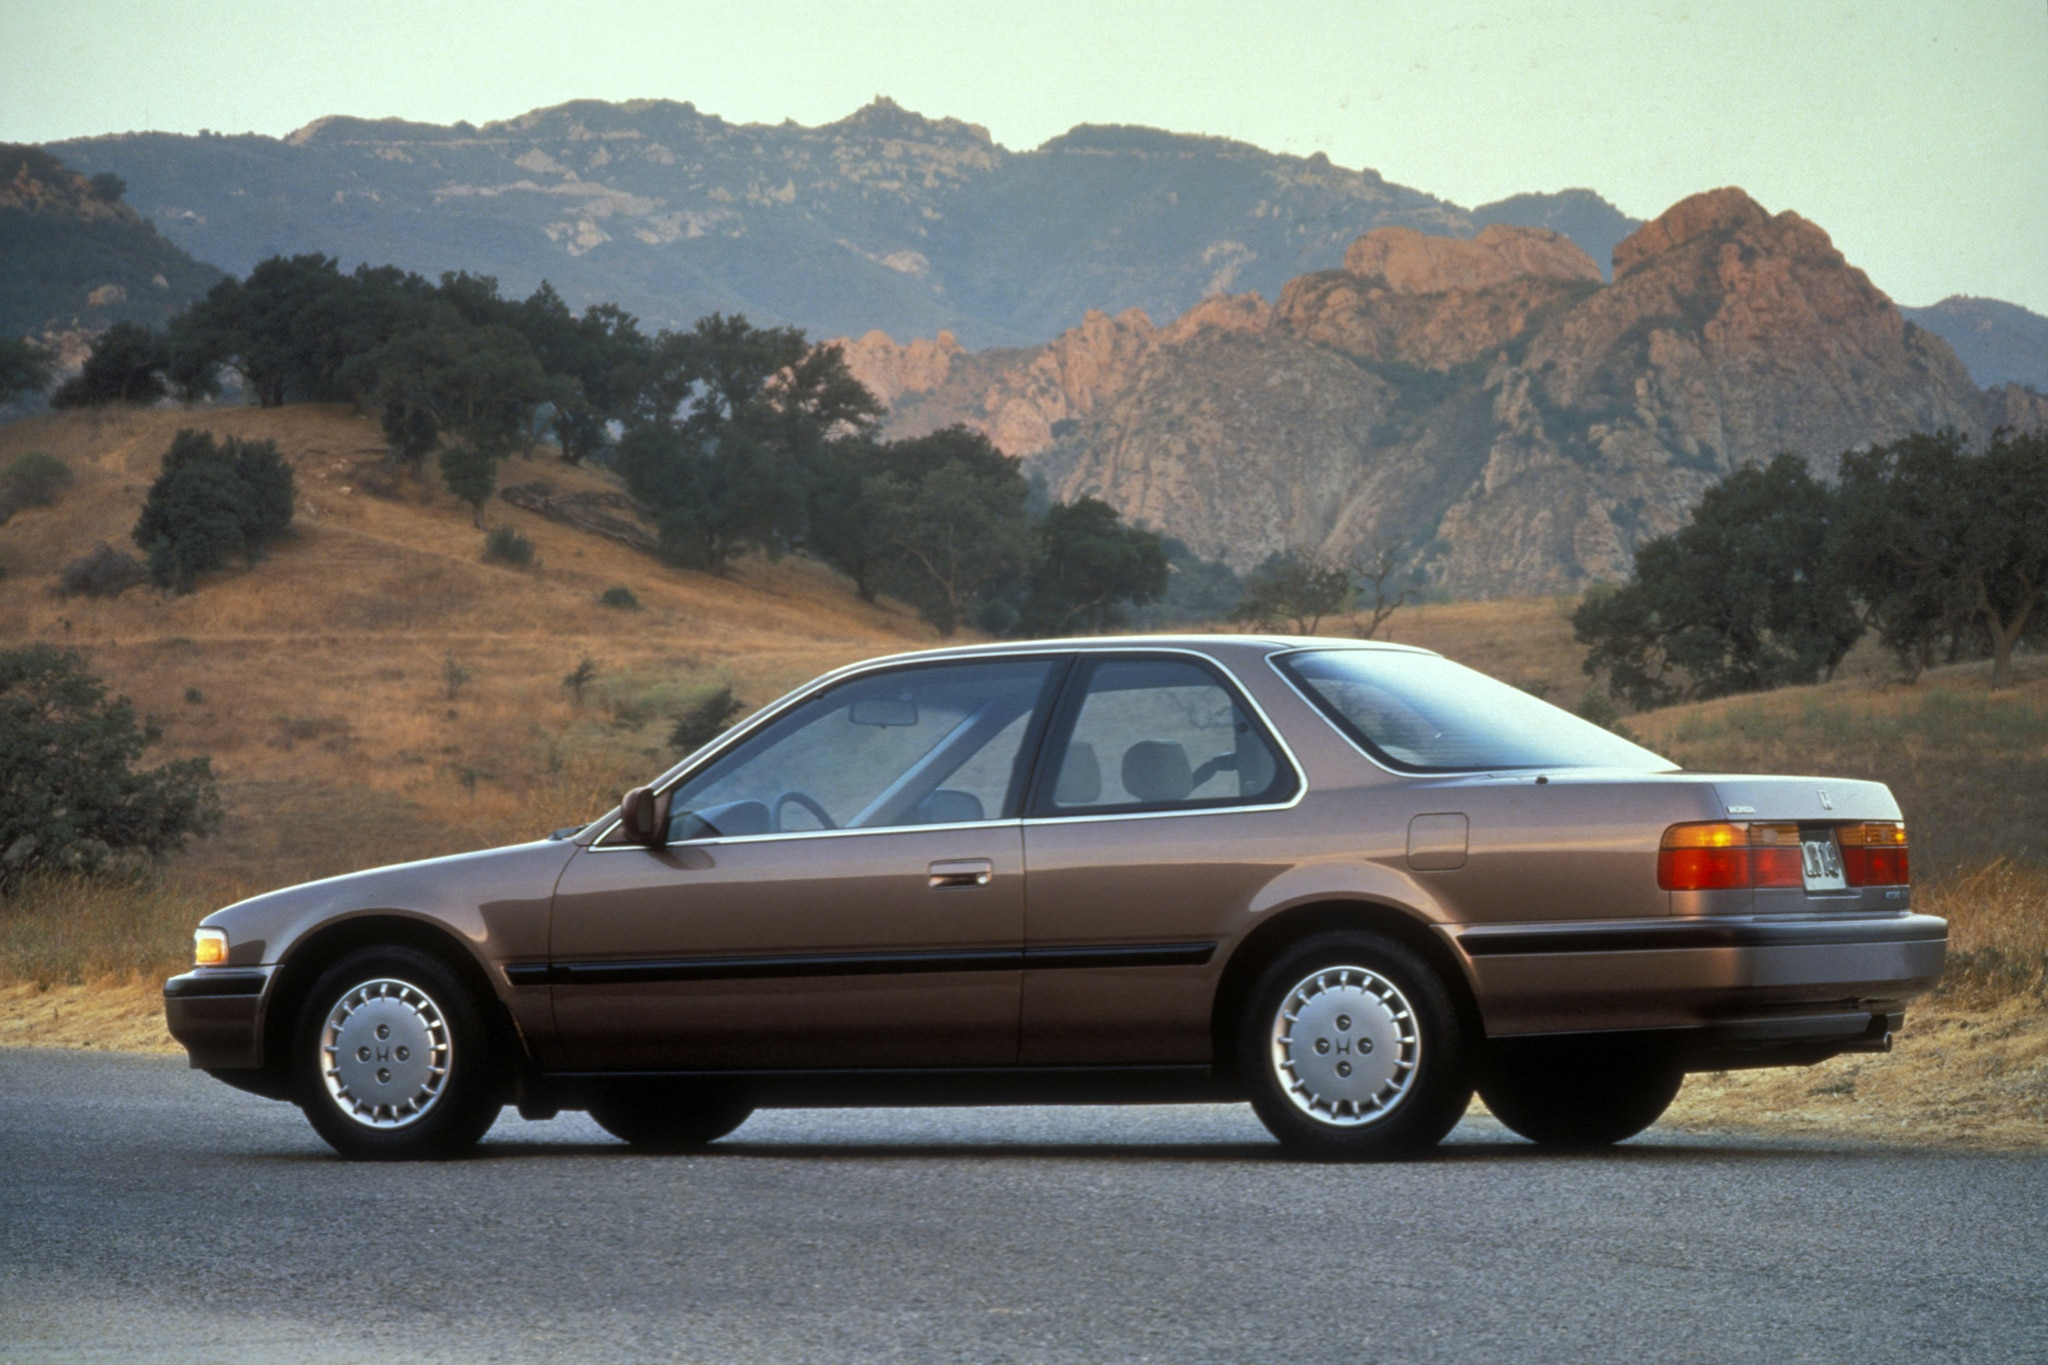 1991 honda accord 4th generation 01 1 automobile for Honda accord generations